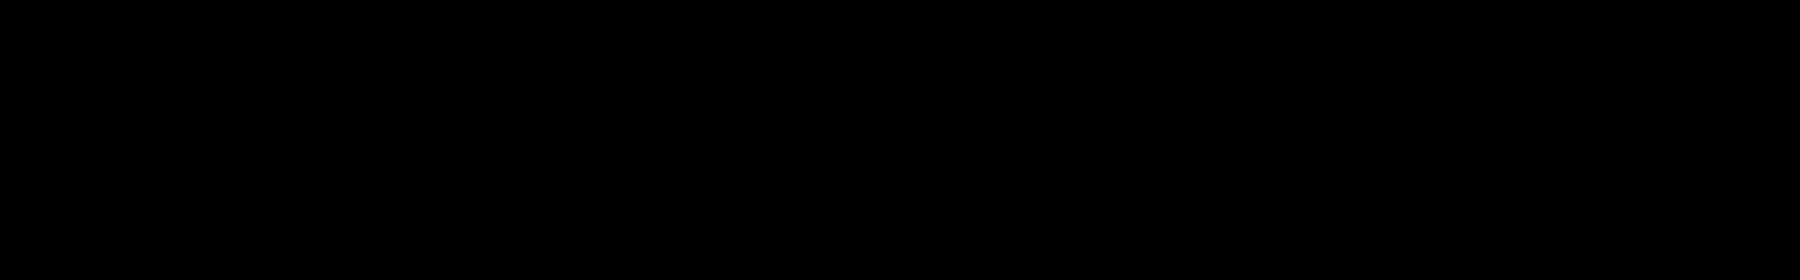 Retro Ambient Cinematic audio waveform